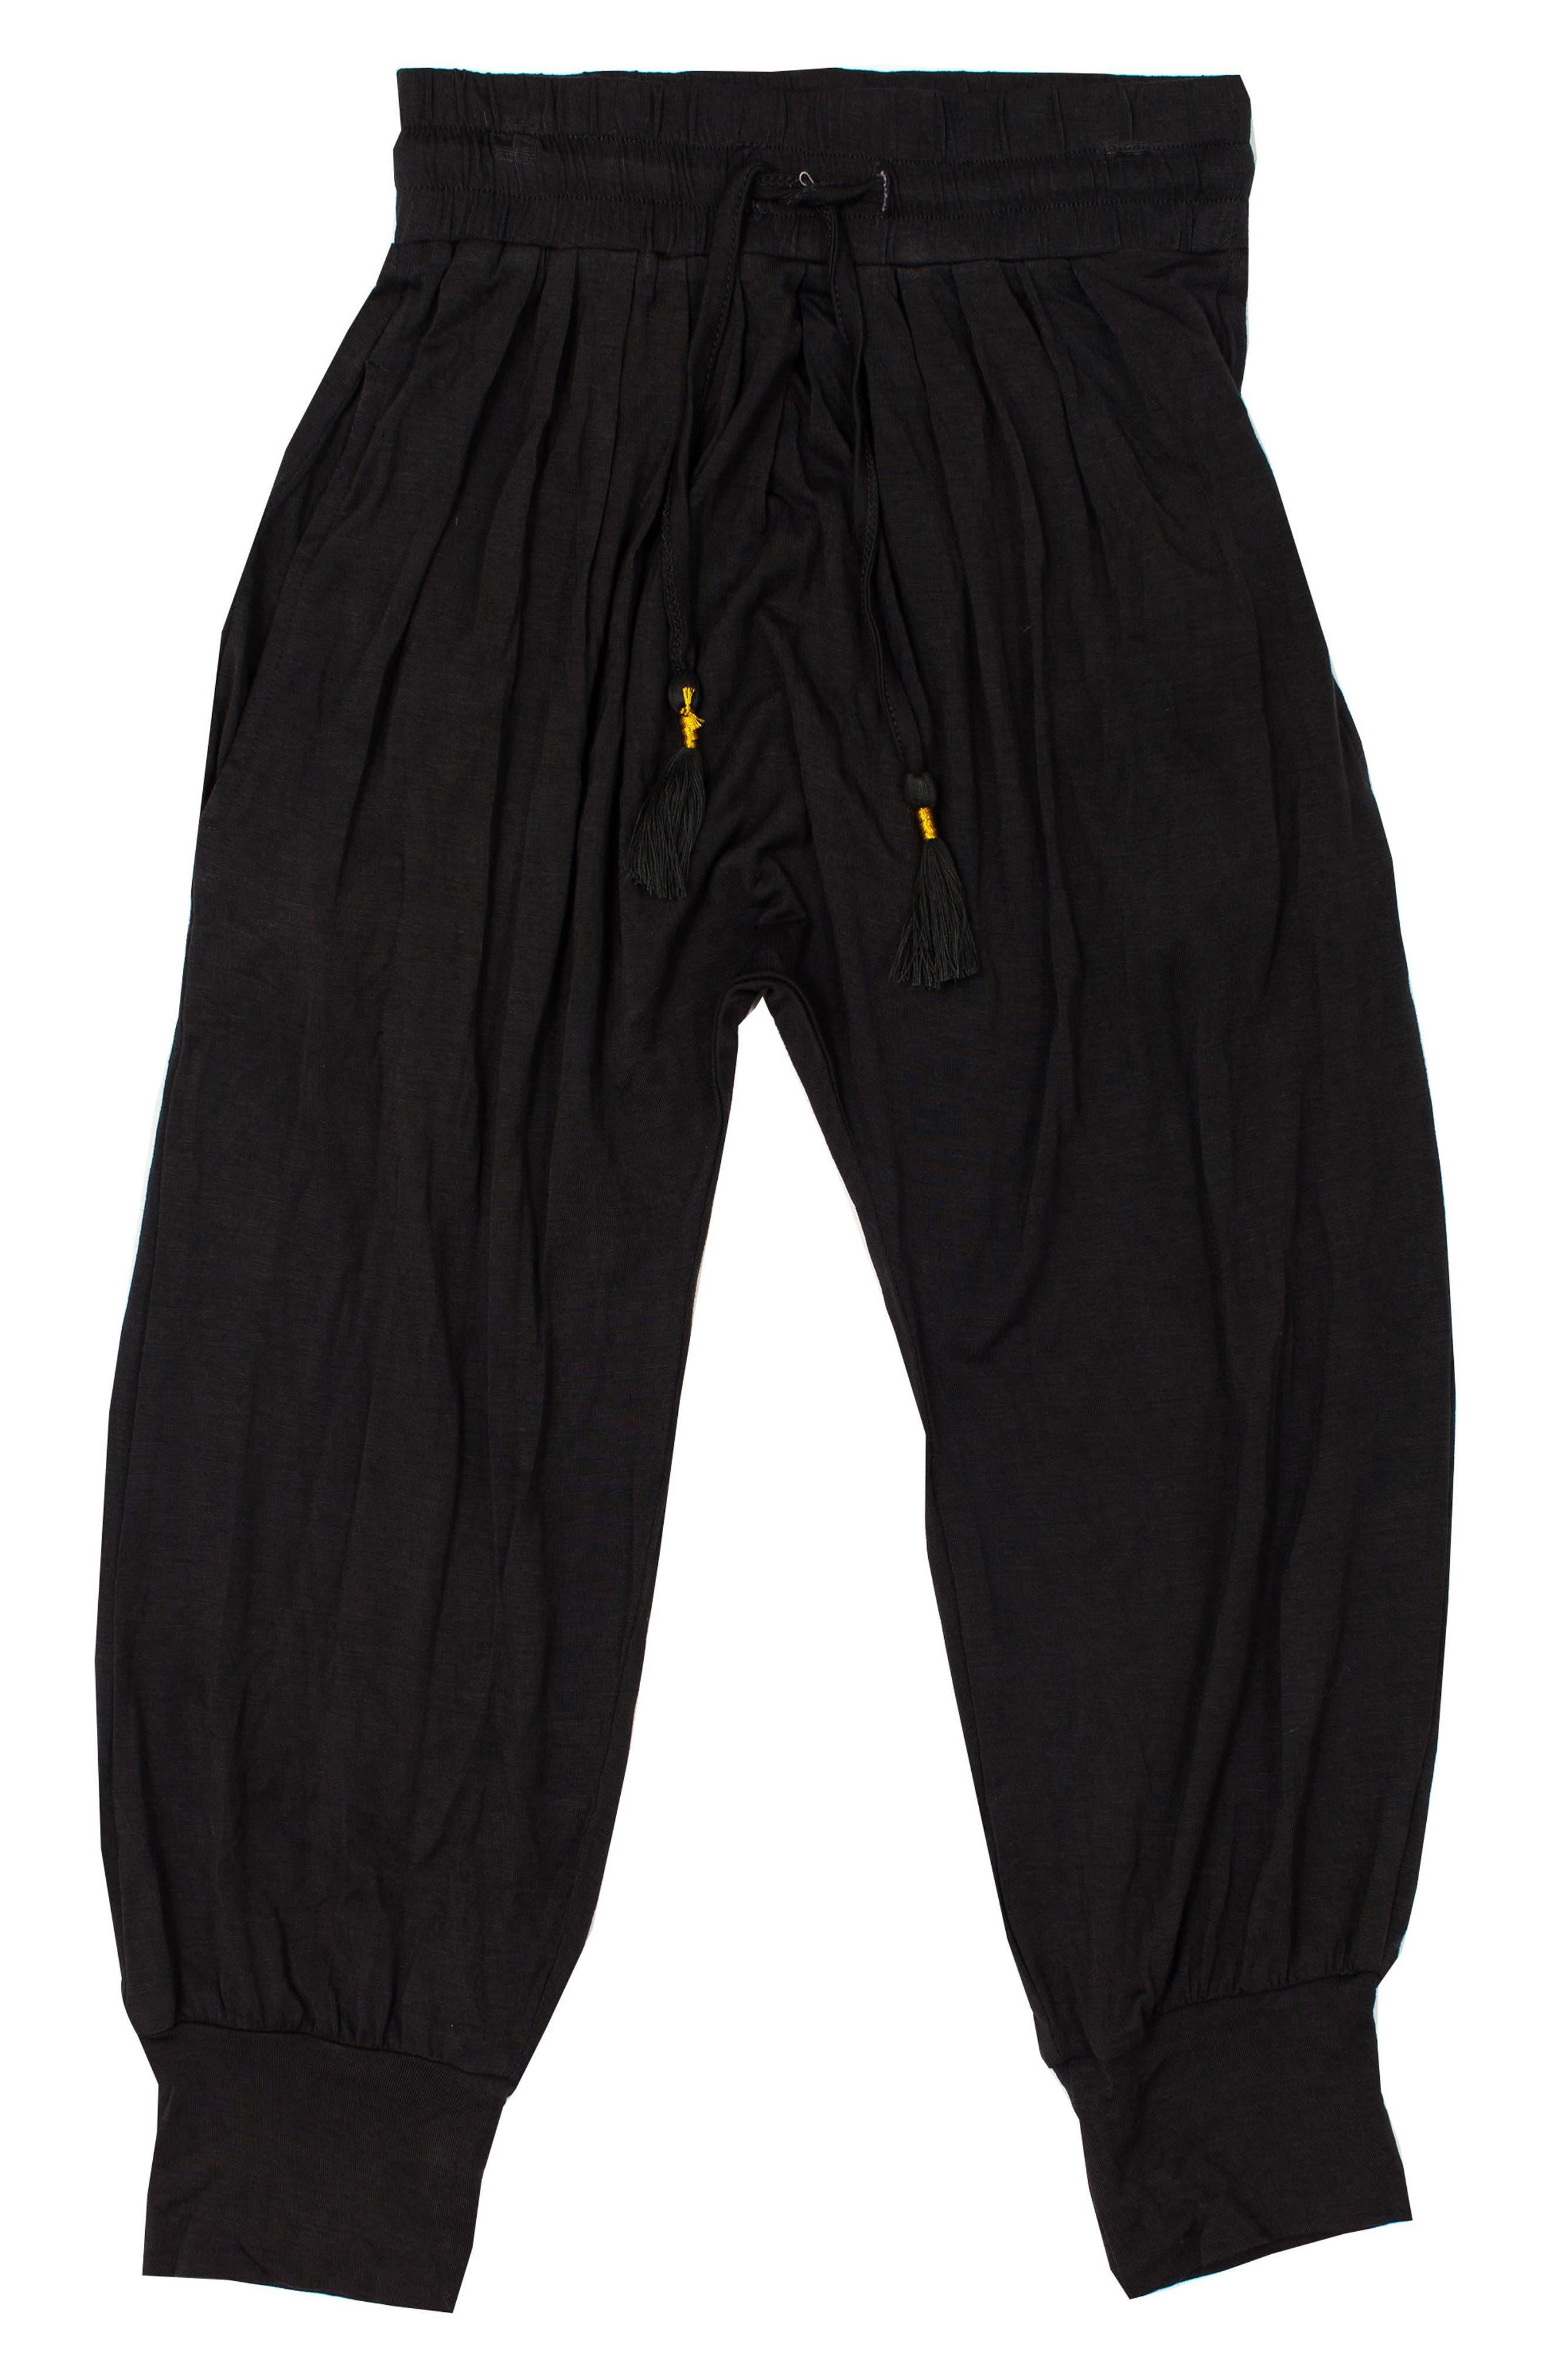 Gathered Pants,                             Main thumbnail 1, color,                             TITANIUM